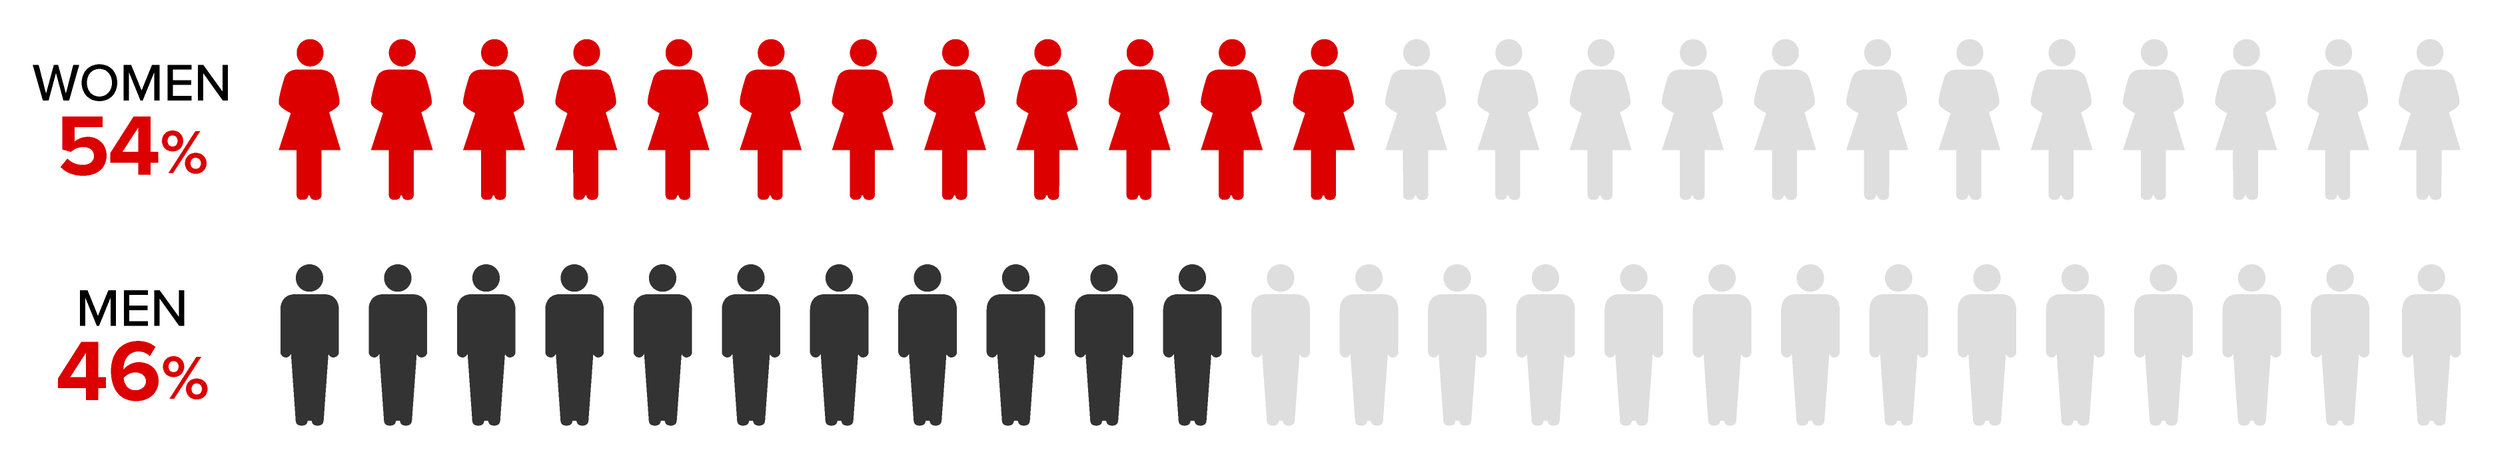 Demographic-Gender.jpg